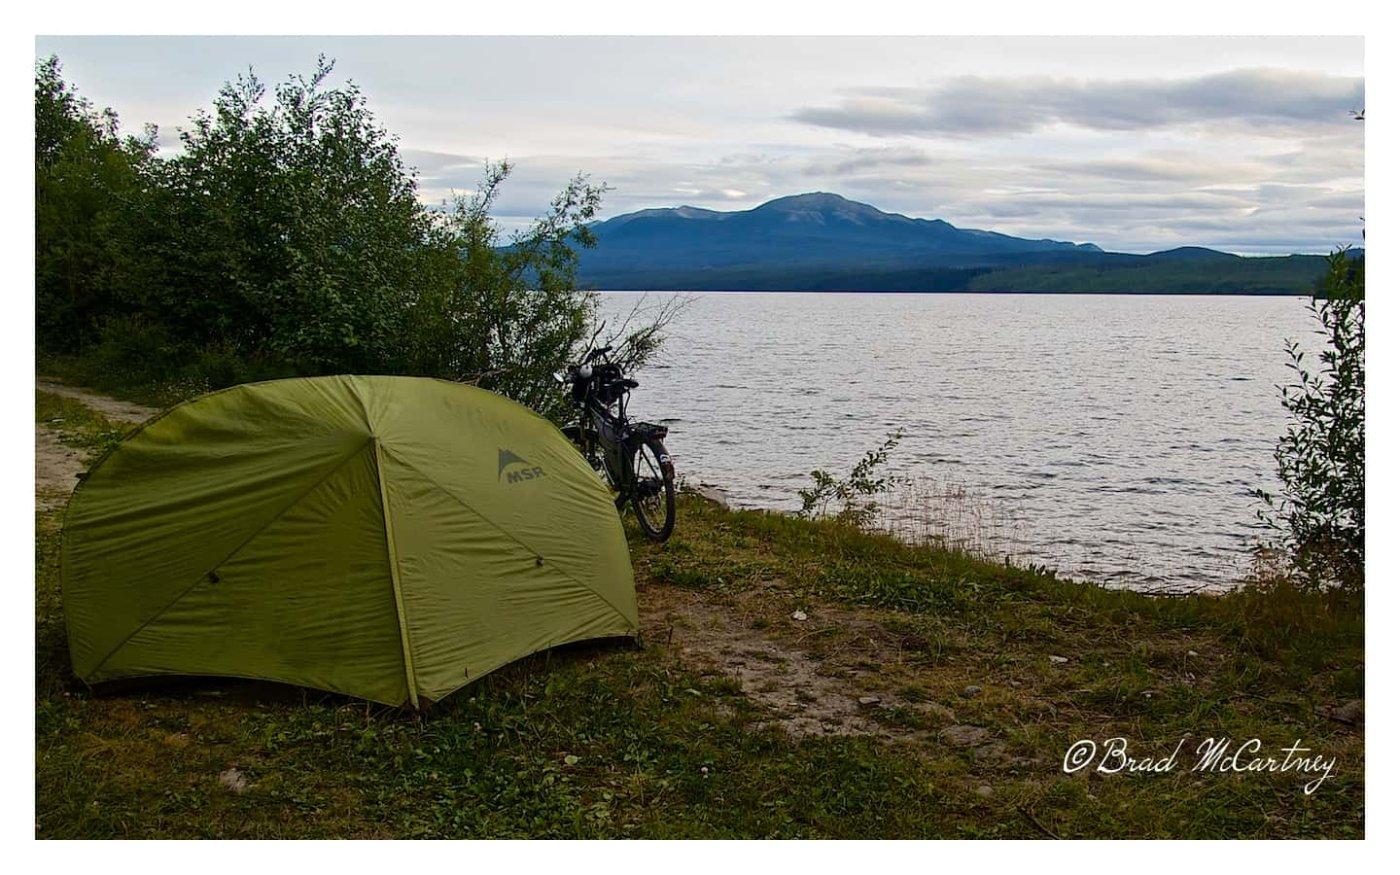 Robert Campbell highway camping